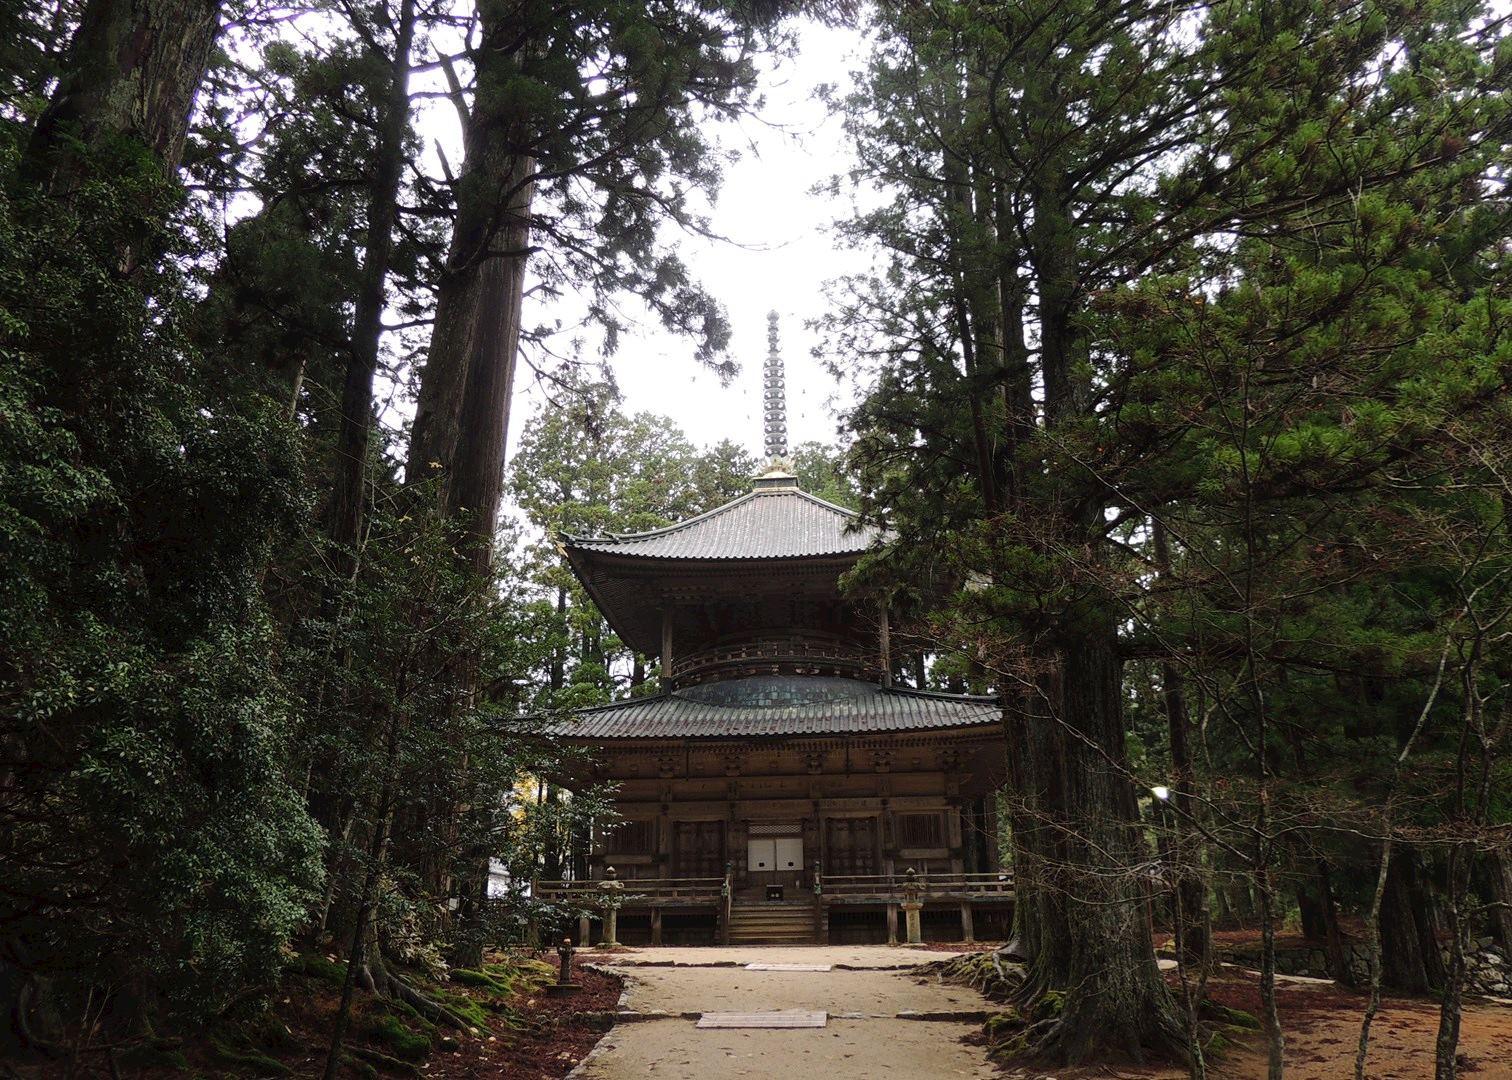 Visit Mount Koya on a trip to Japan  Audley Travel